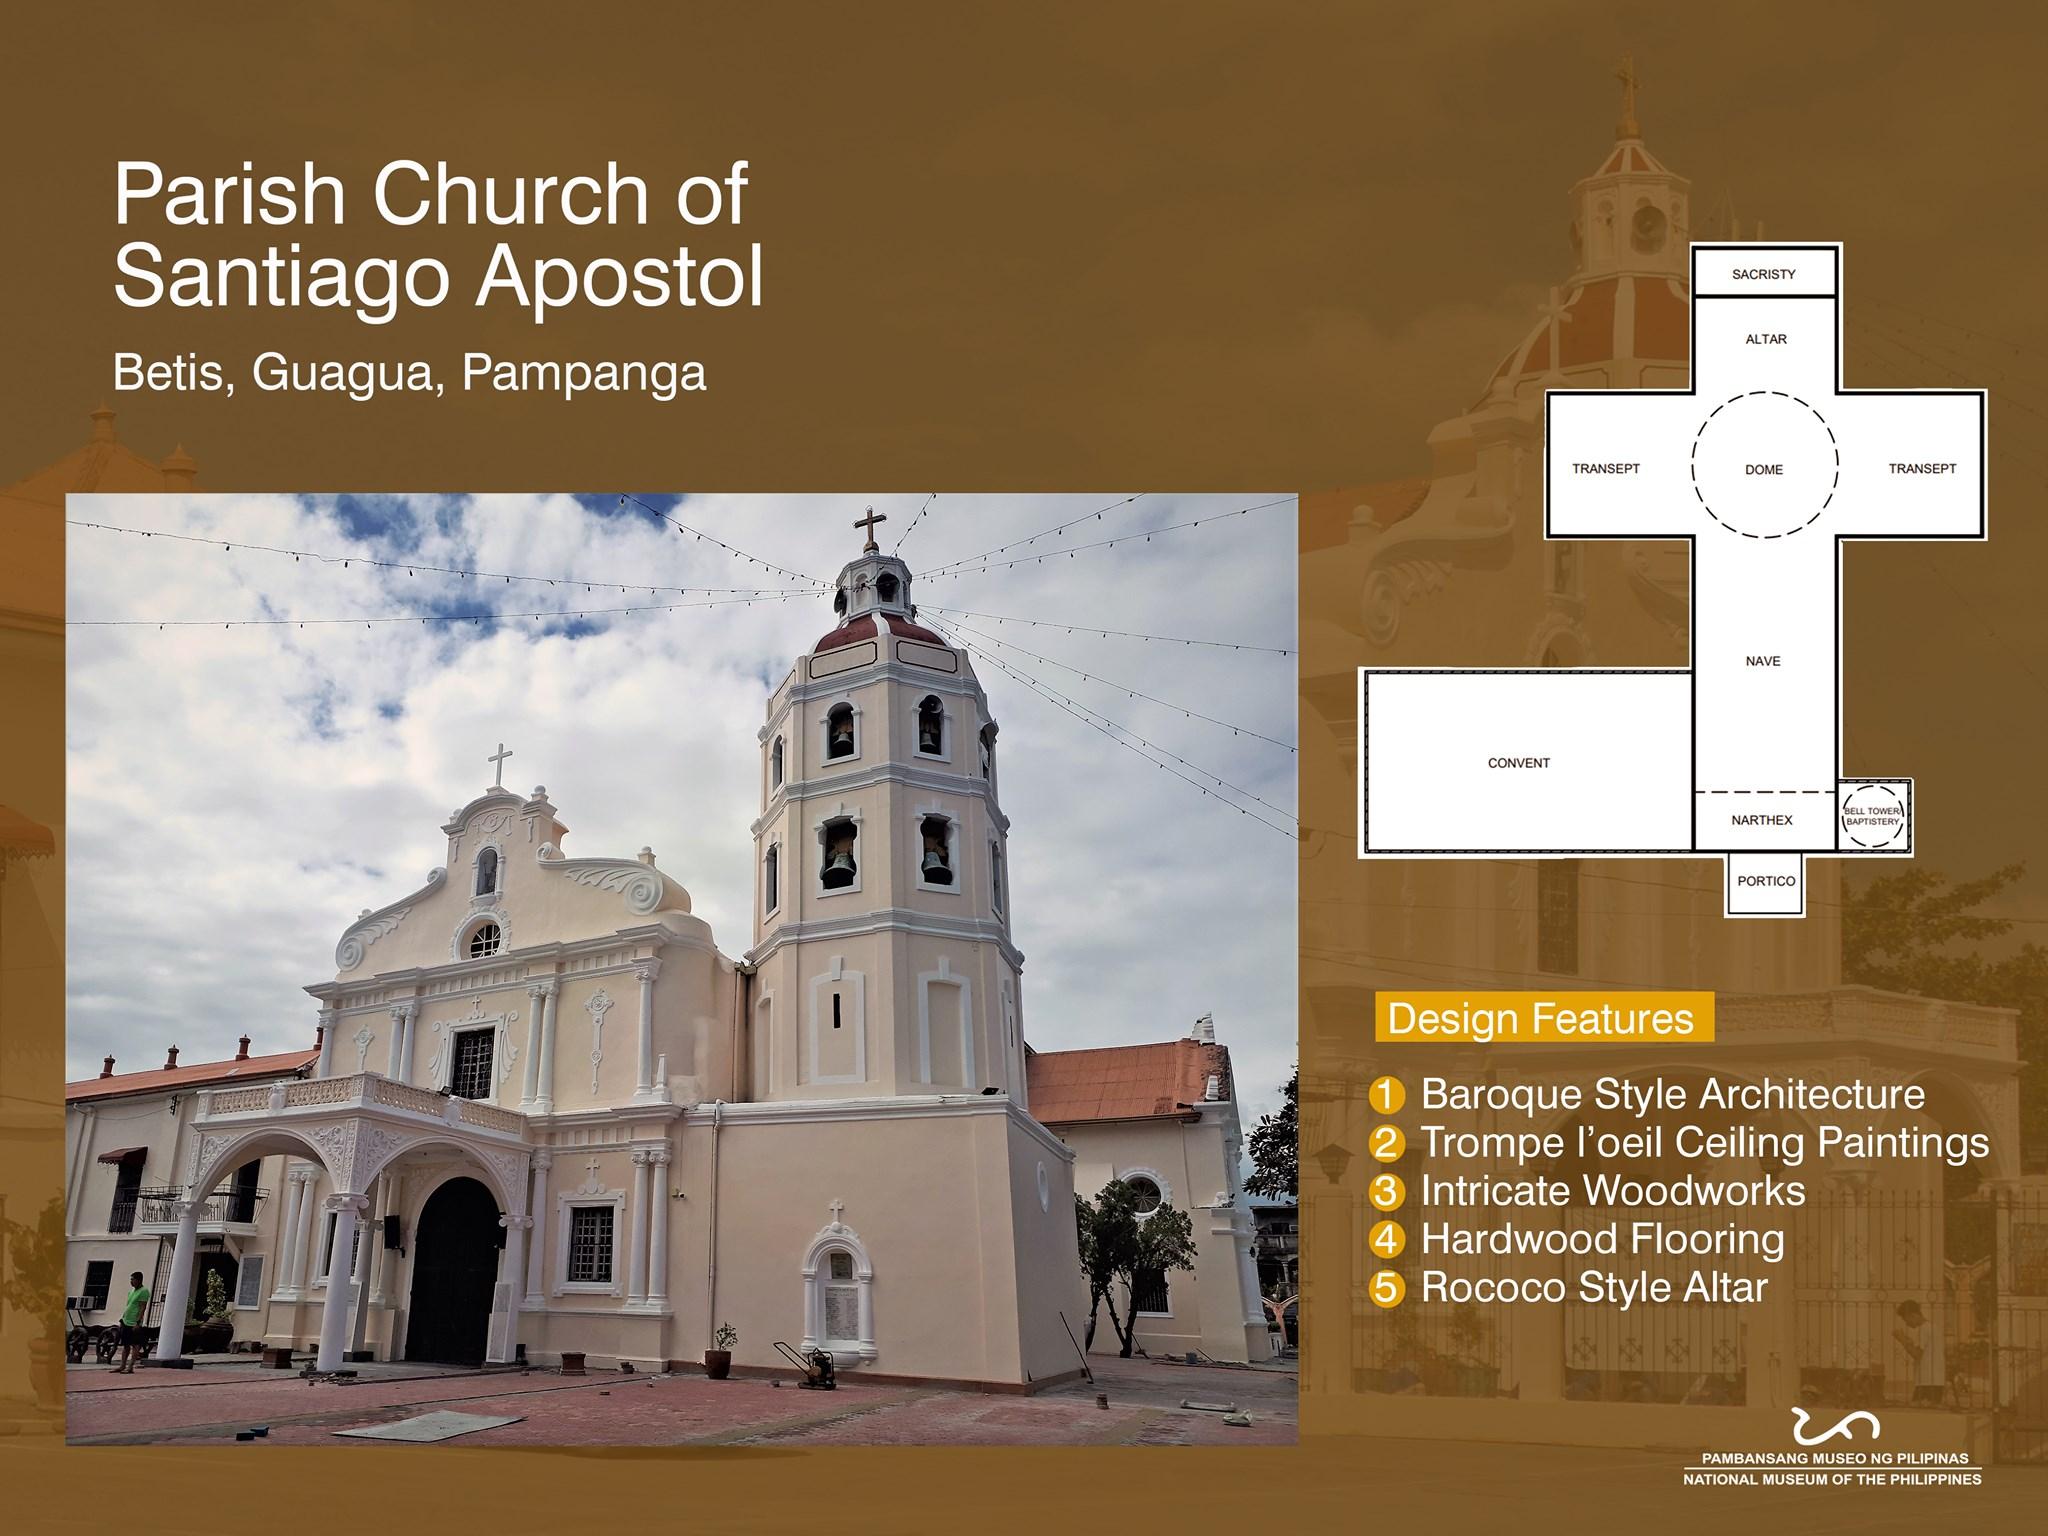 Parish Church of Santiago Apostol also known as Betis Church in Guagua, Pampanga